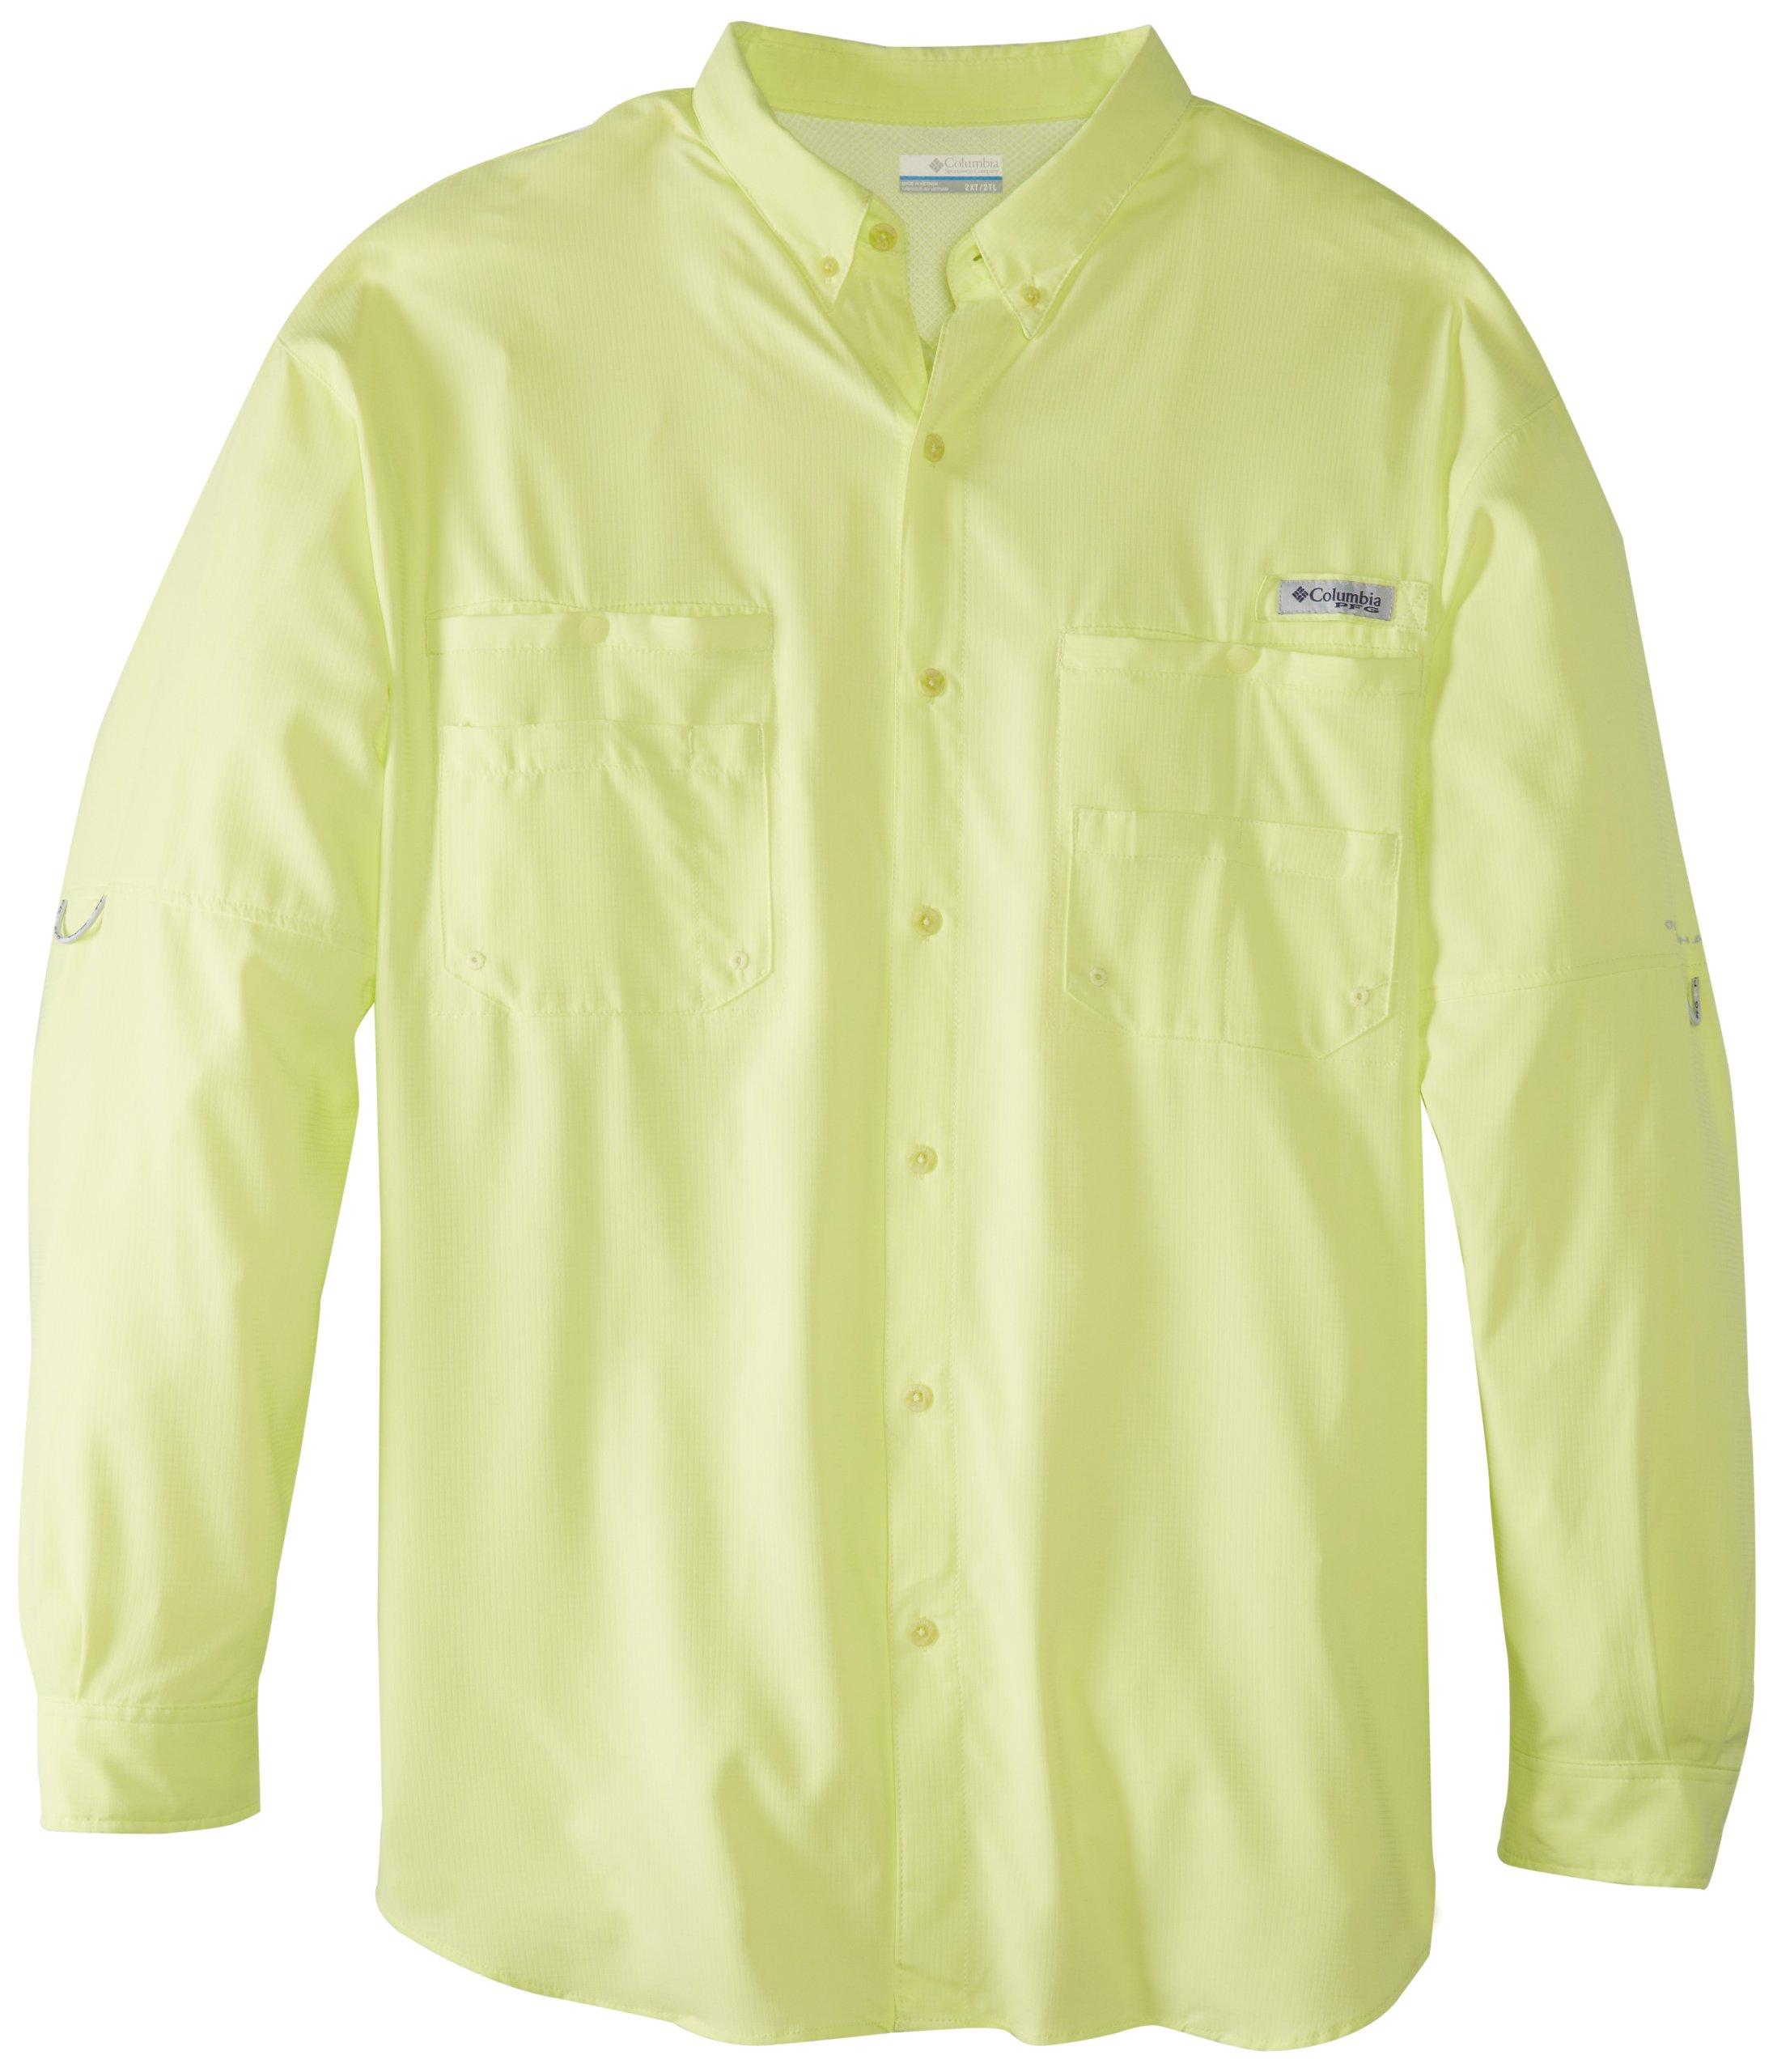 06abc748e80 Columbia Bonehead Shirt Long Sleeve - DREAMWORKS